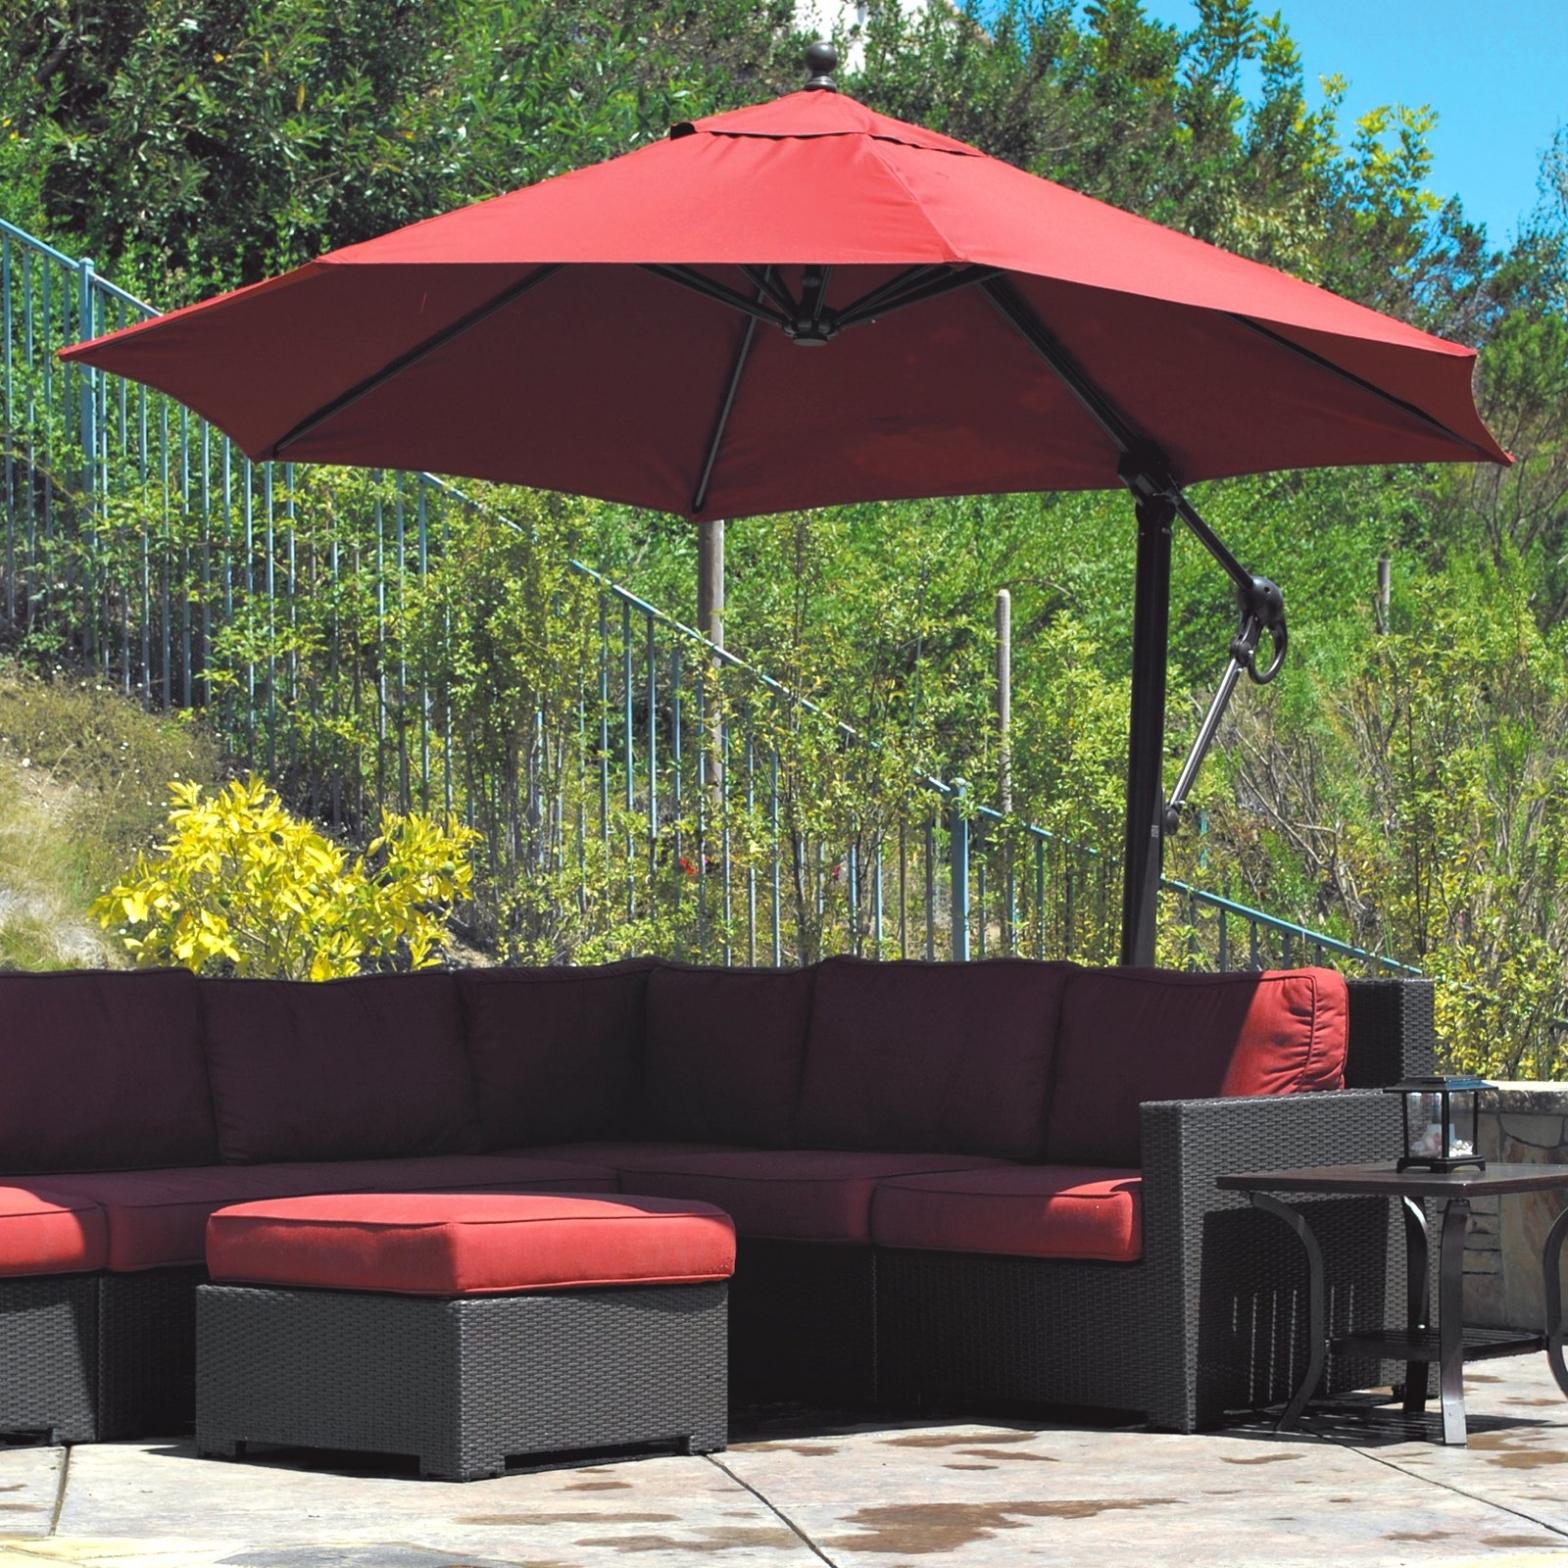 Trendy Ideas & Tips: Offset Patio Umbrellas Best Offset — The Home Redesign Regarding Offset Patio Umbrellas (View 8 of 20)